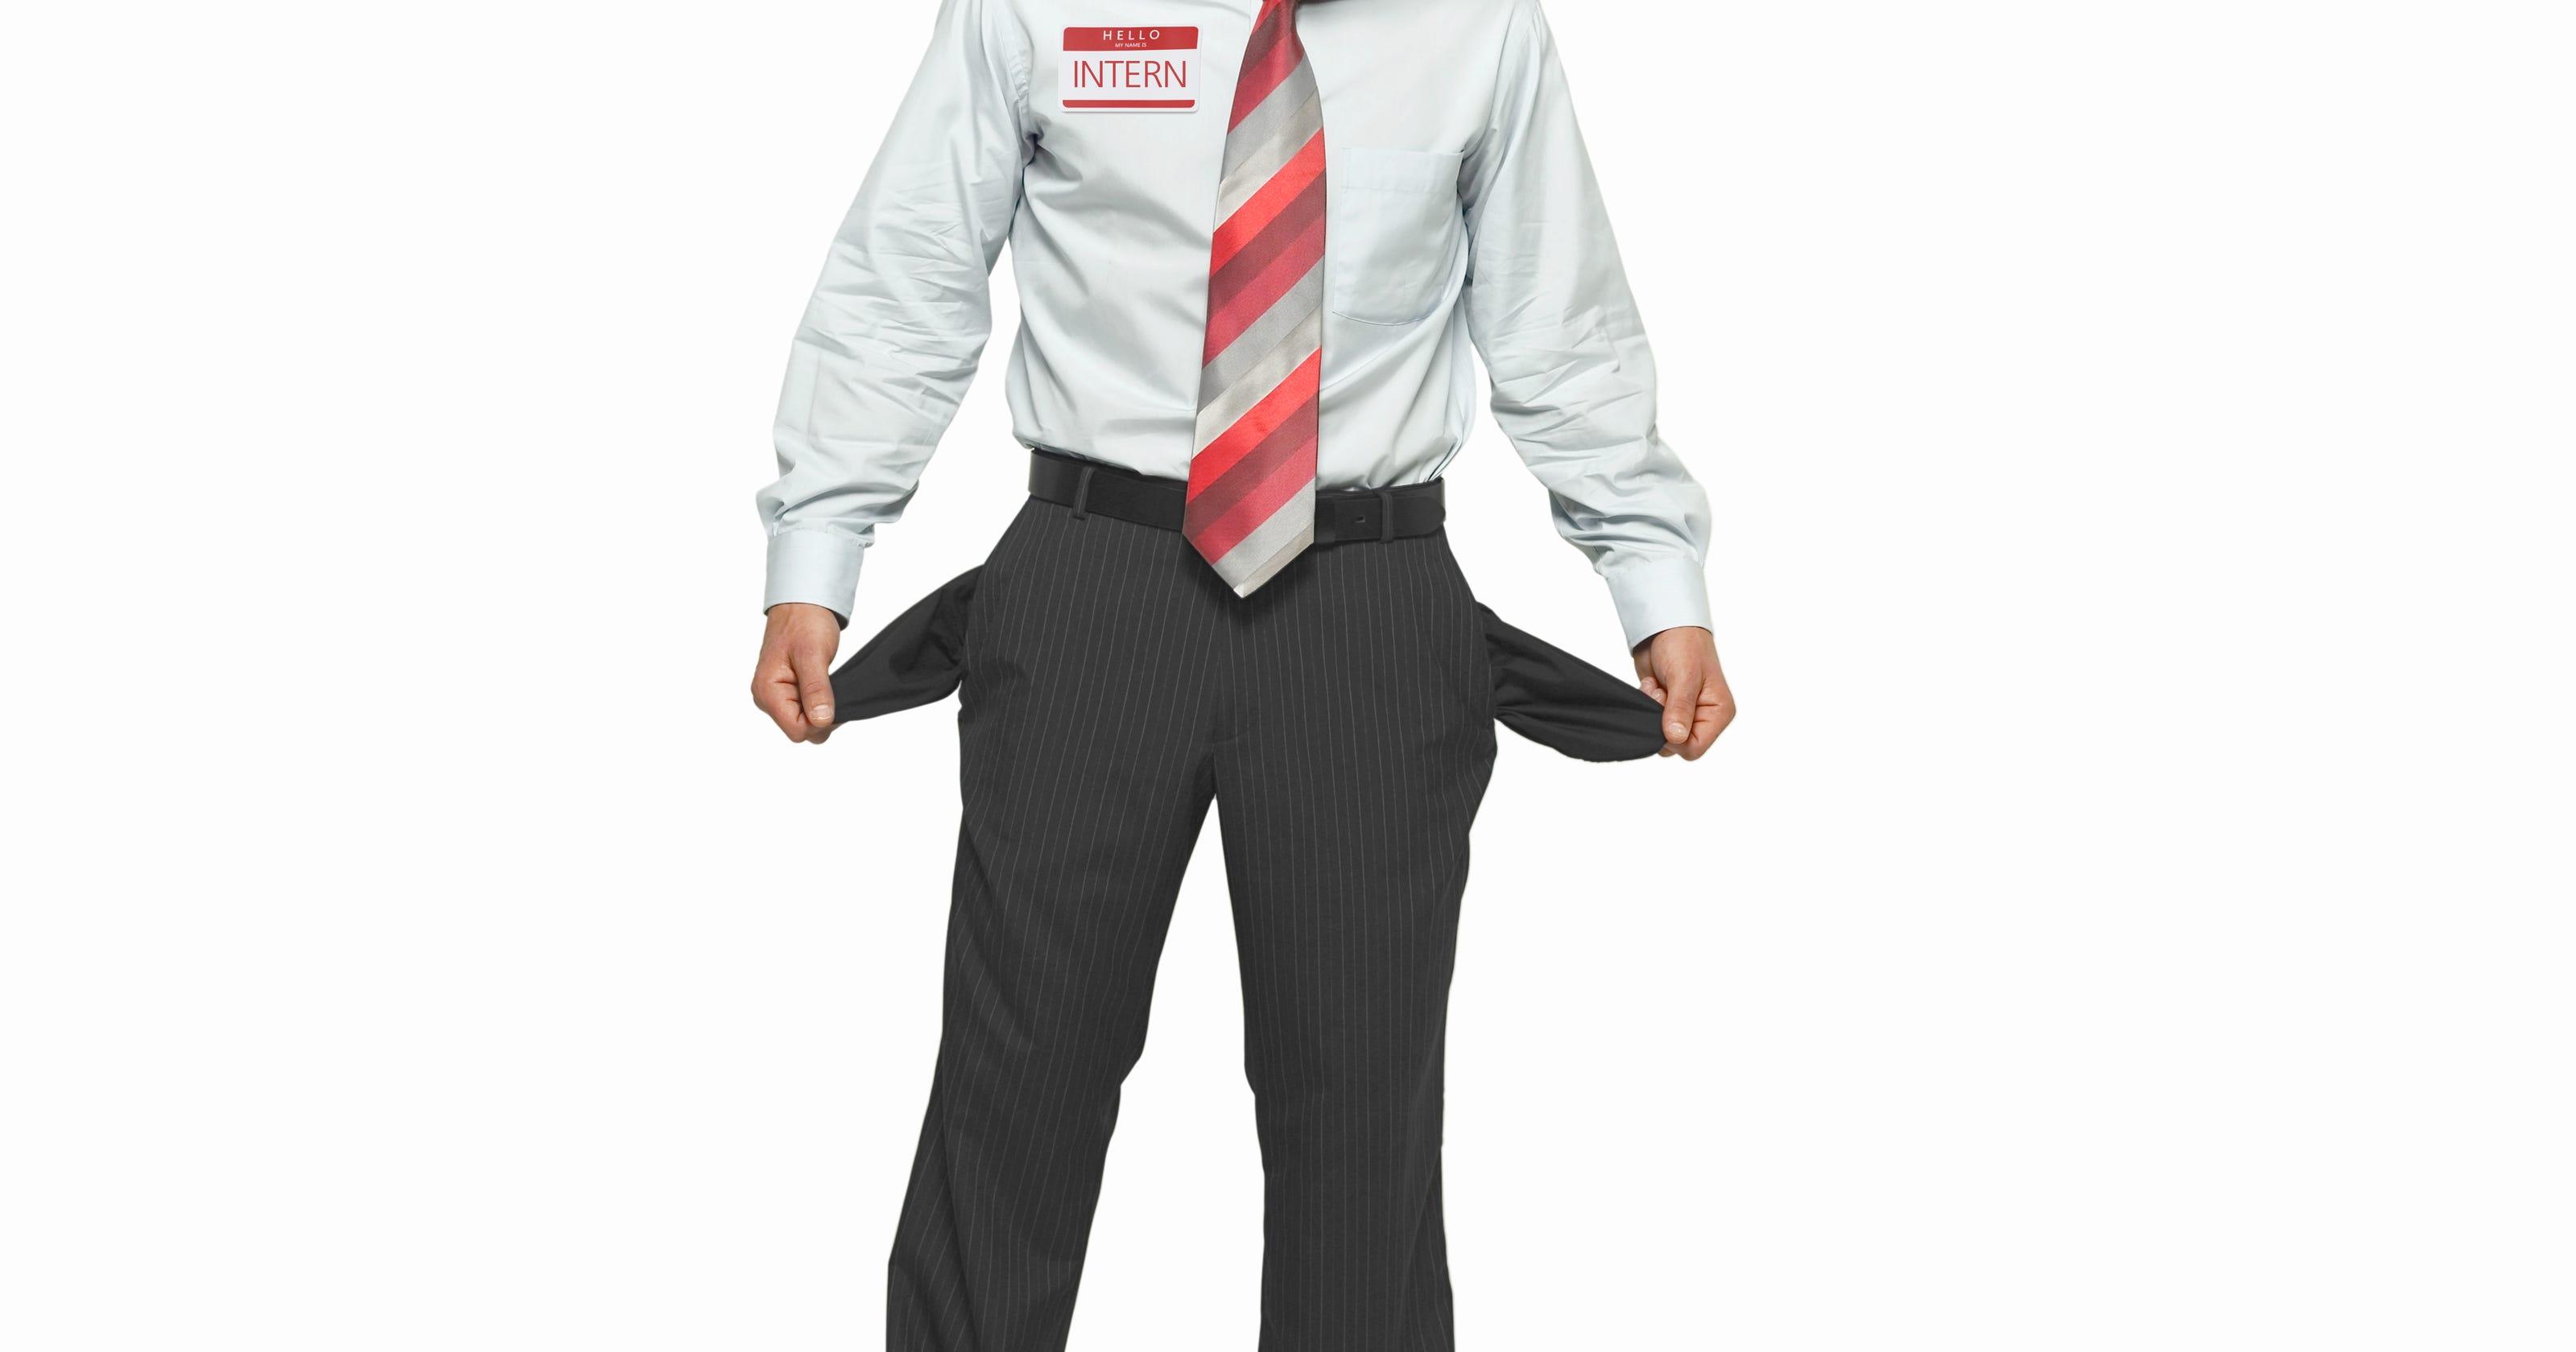 Unpaid internships get new scrutiny